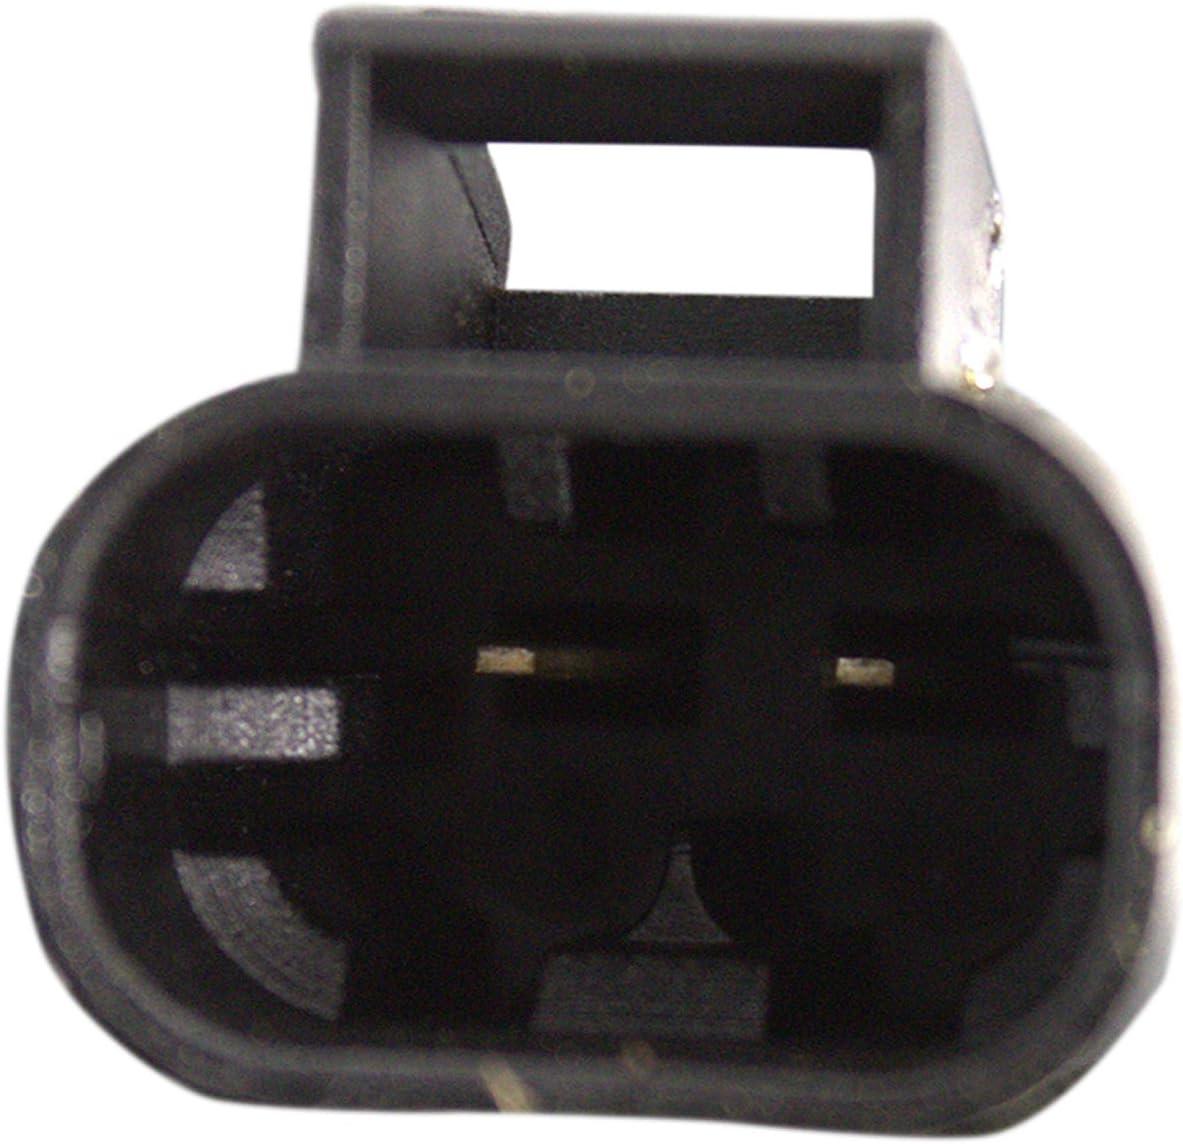 1 Pack TrakMotive 21-0379 Window Regulator Assembly